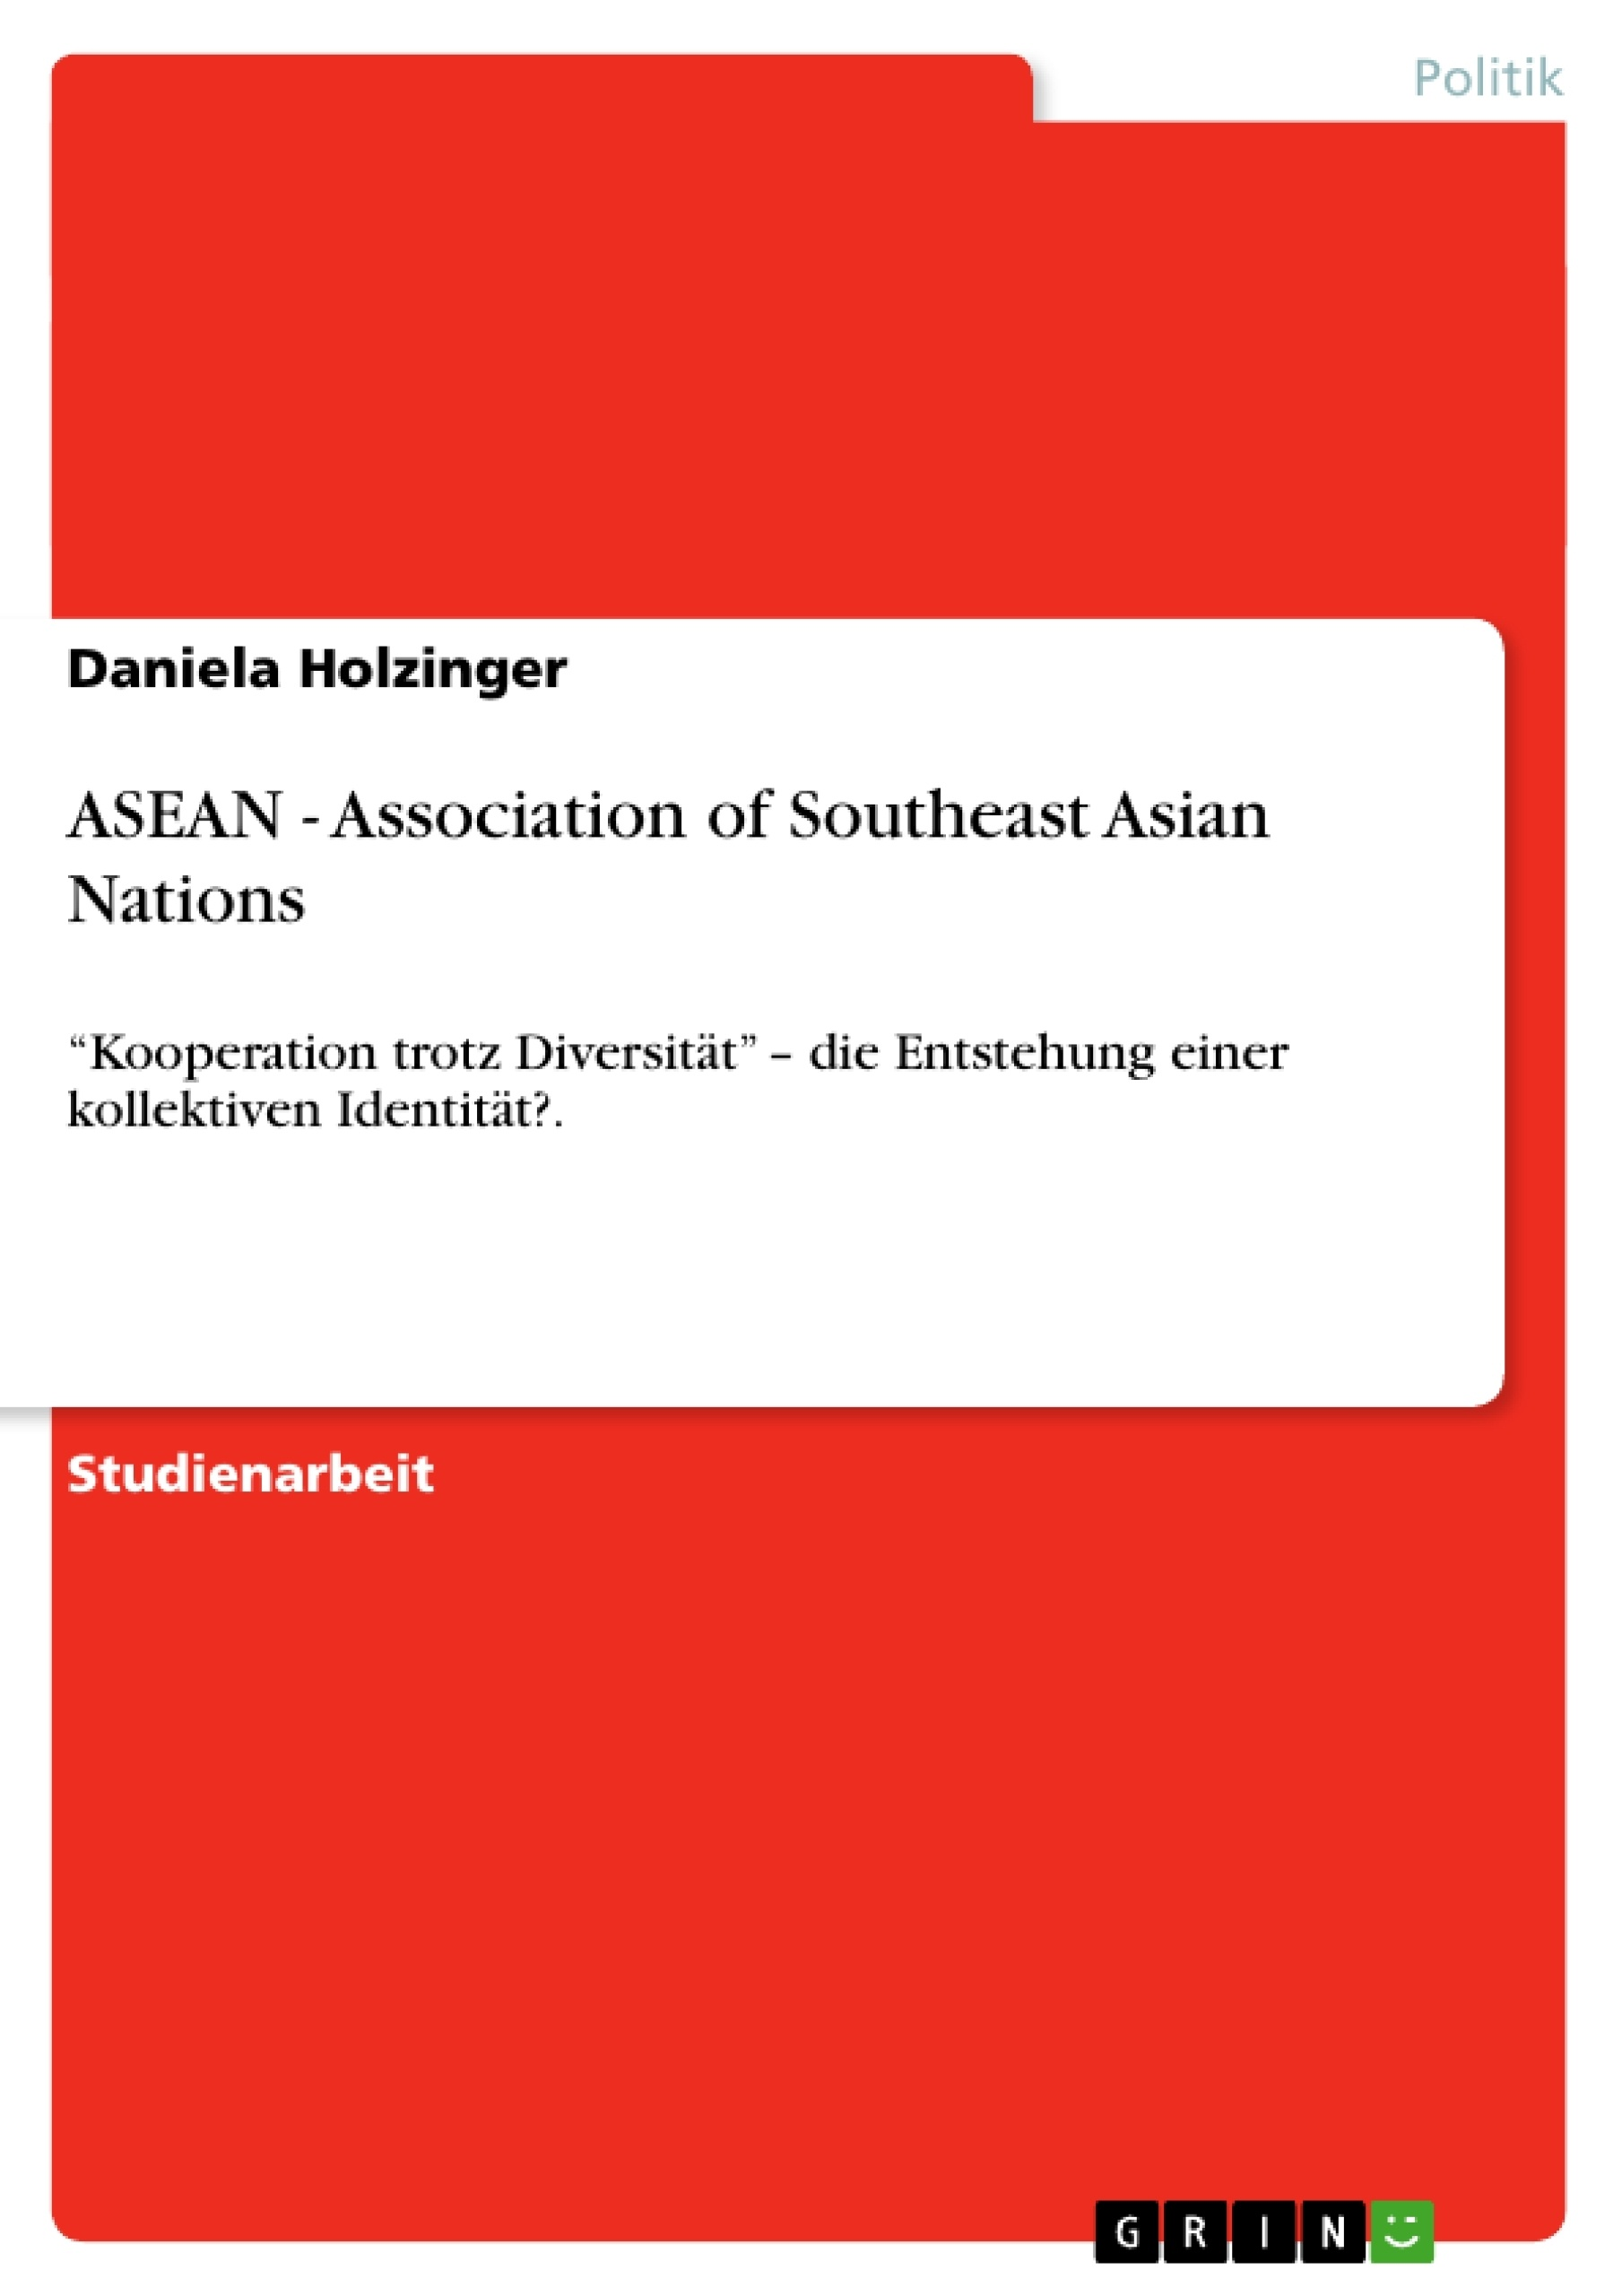 Titel: ASEAN - Association of Southeast Asian Nations